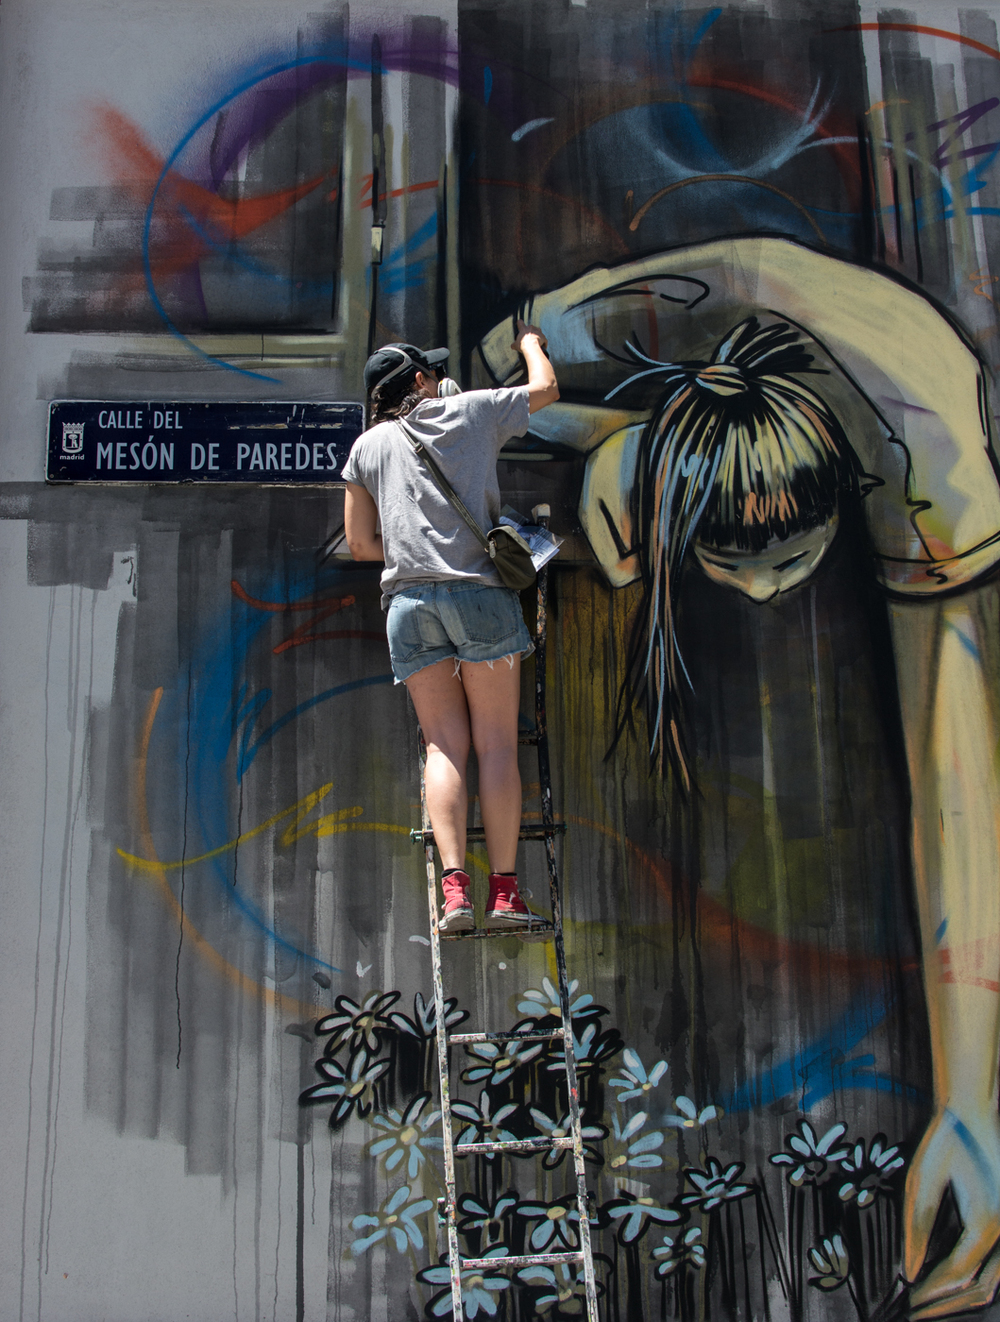 Alice Pasquini - MurosTabacalera by Guillermo de la Madrid - Madrid Street Art Project-13-2.jpg